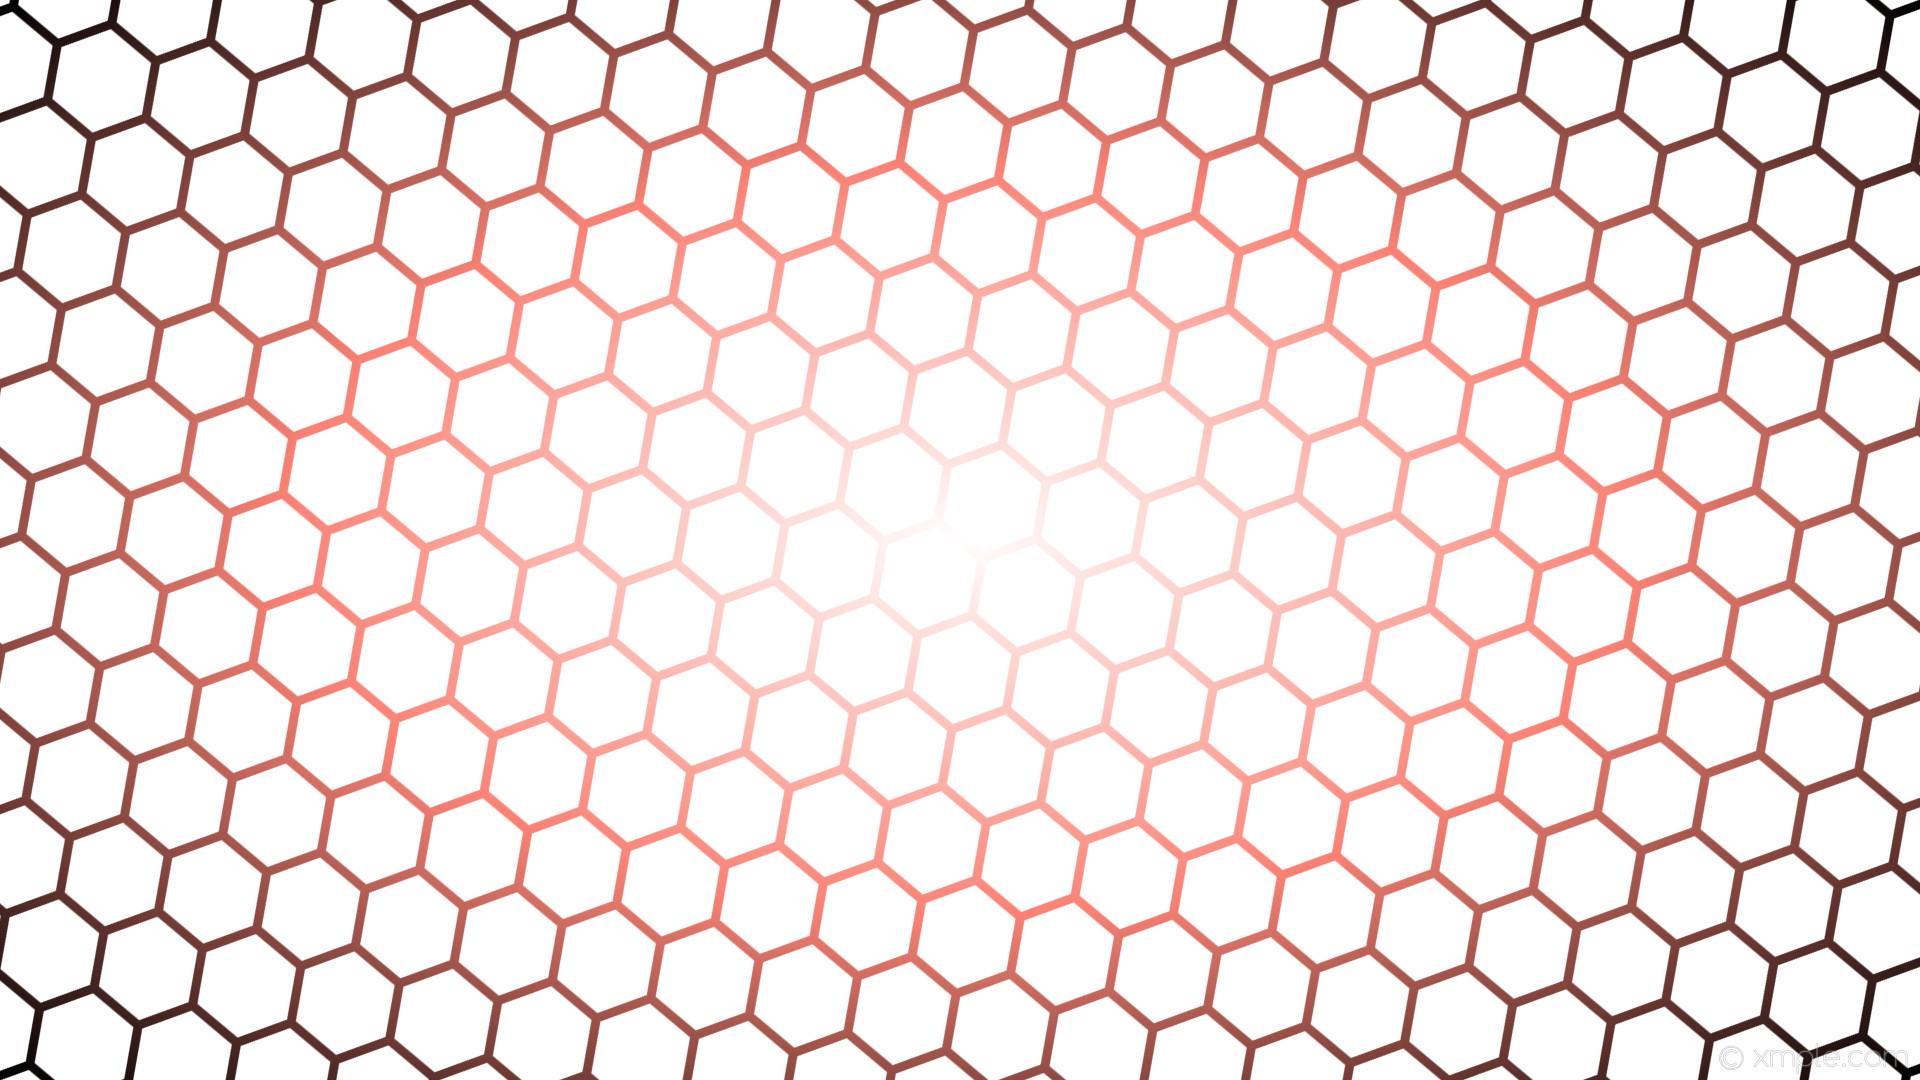 wallpaper glow hexagon black red gradient white #ffffff #ffffff